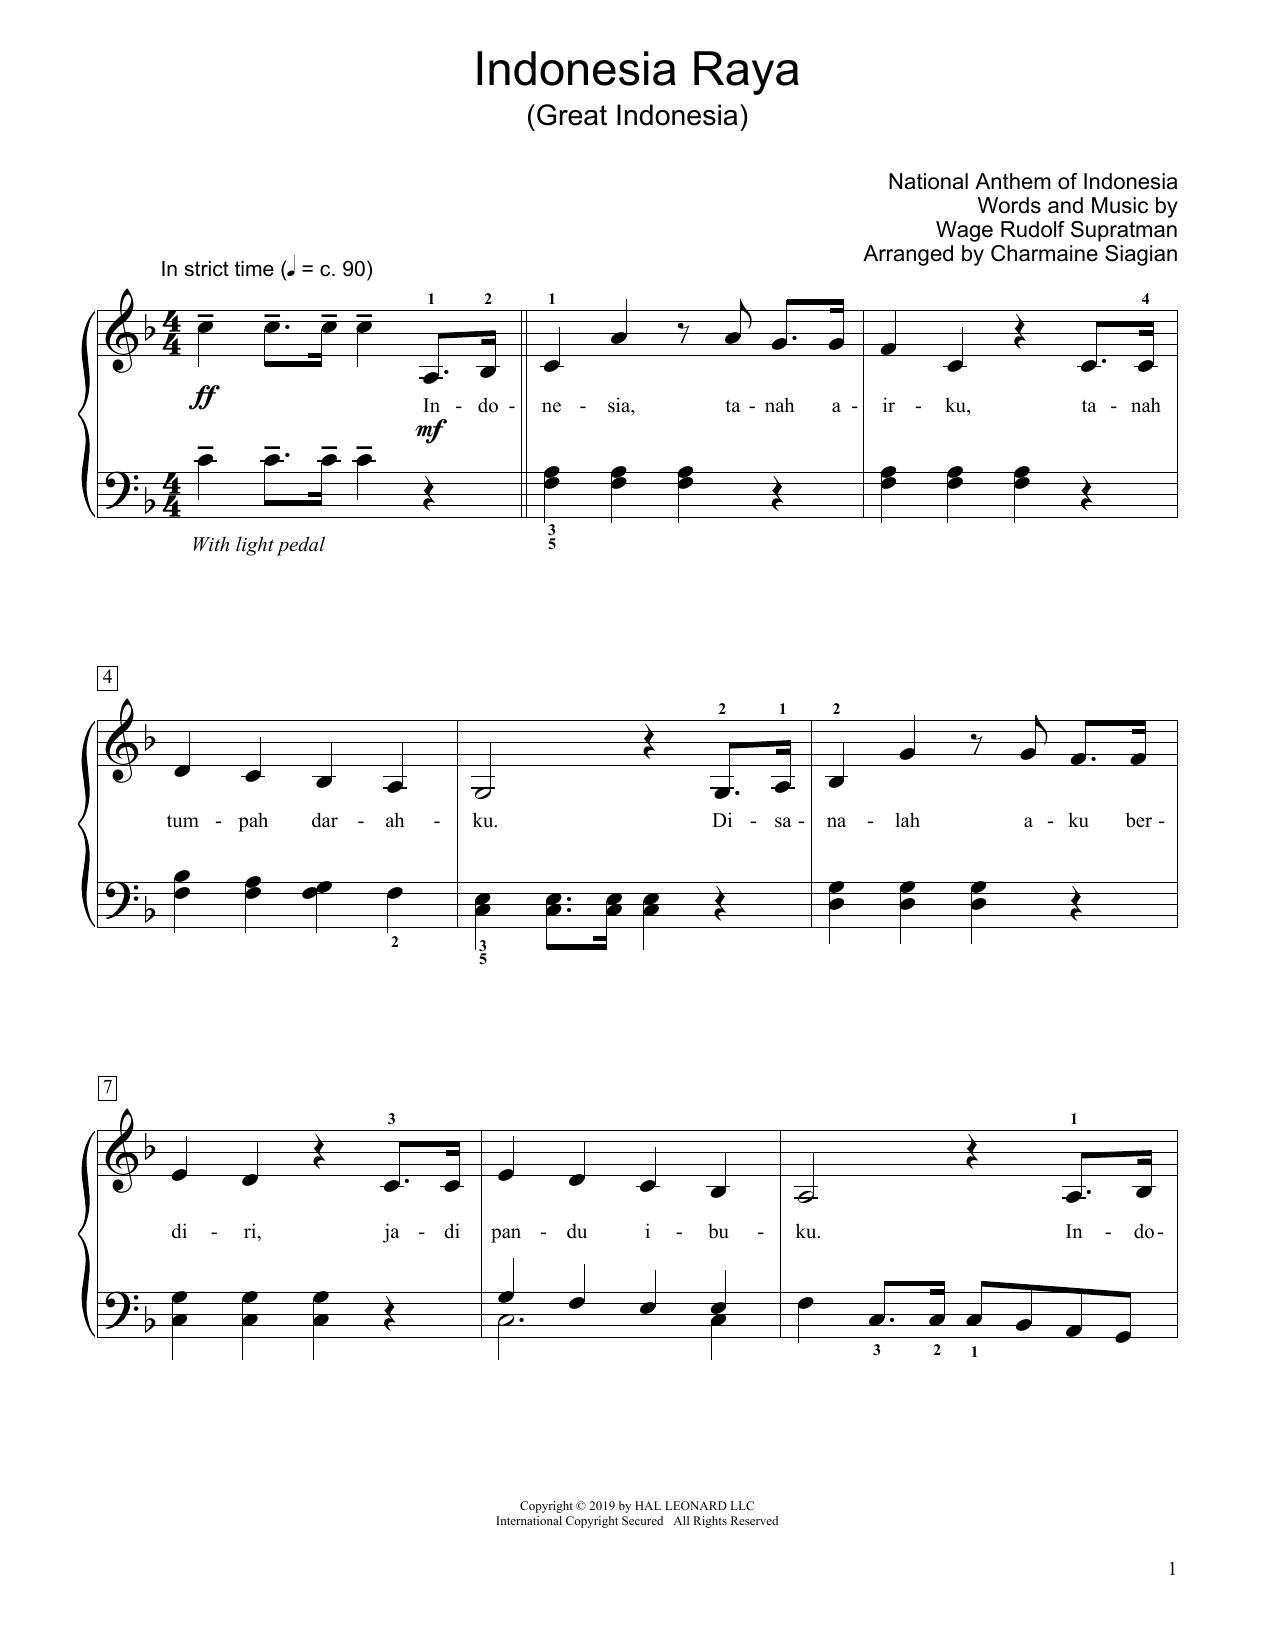 Great Indonesia (Indonesia Raya) (arr. Charmaine Siagian) (Educational Piano)